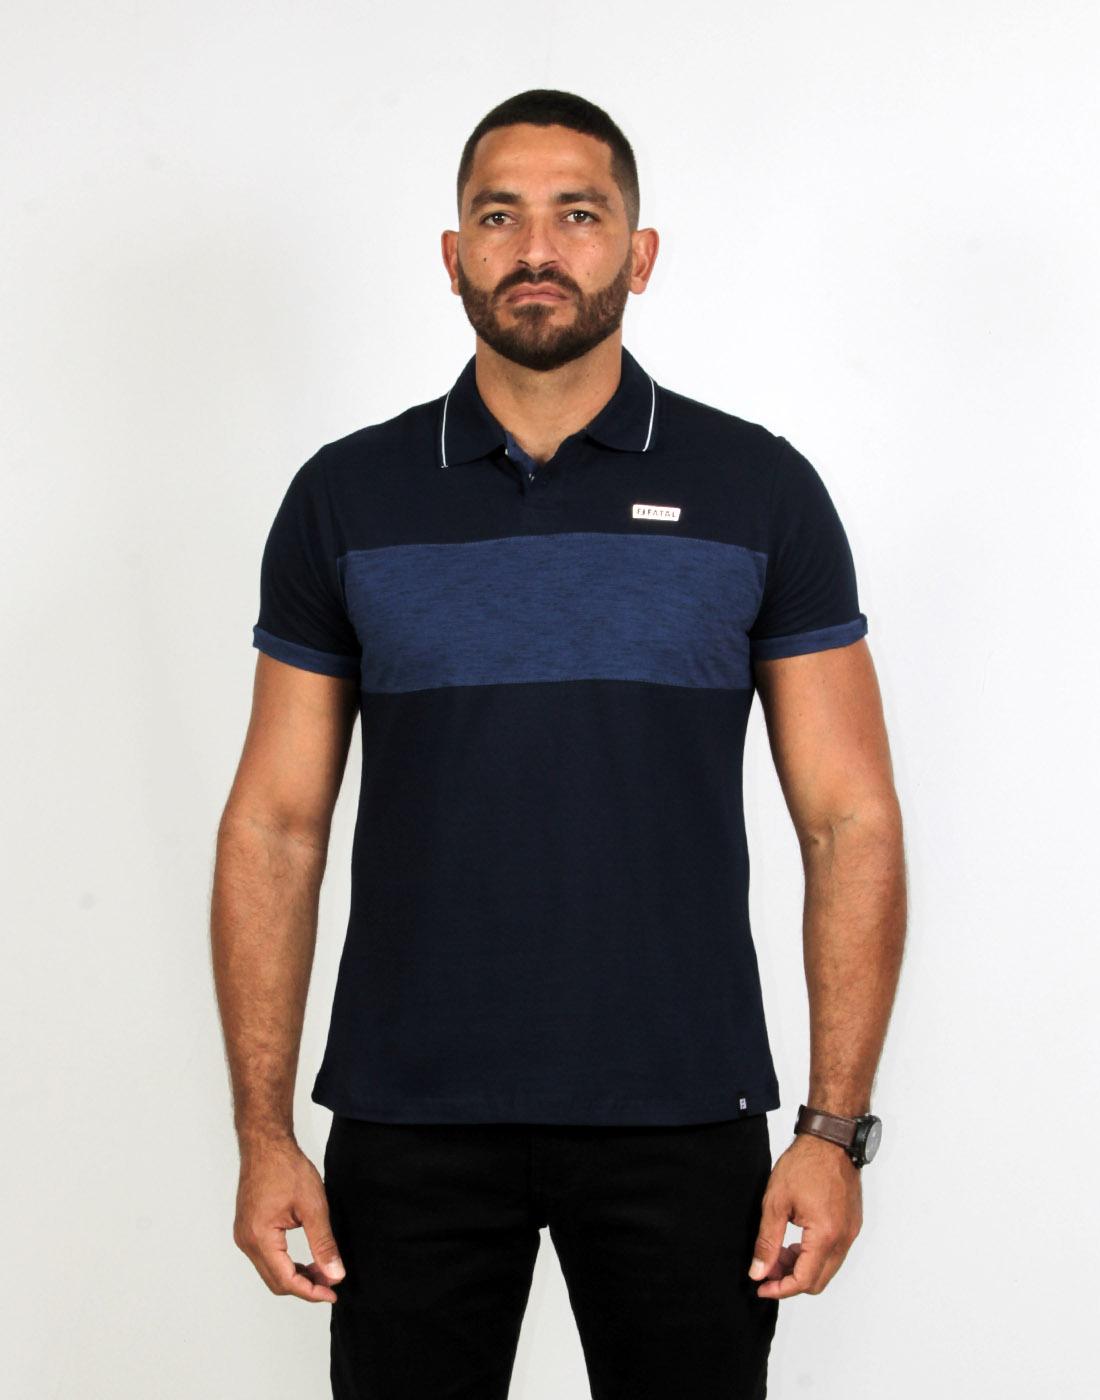 Camiseta Polo Masc. Especial Estampada Fatal